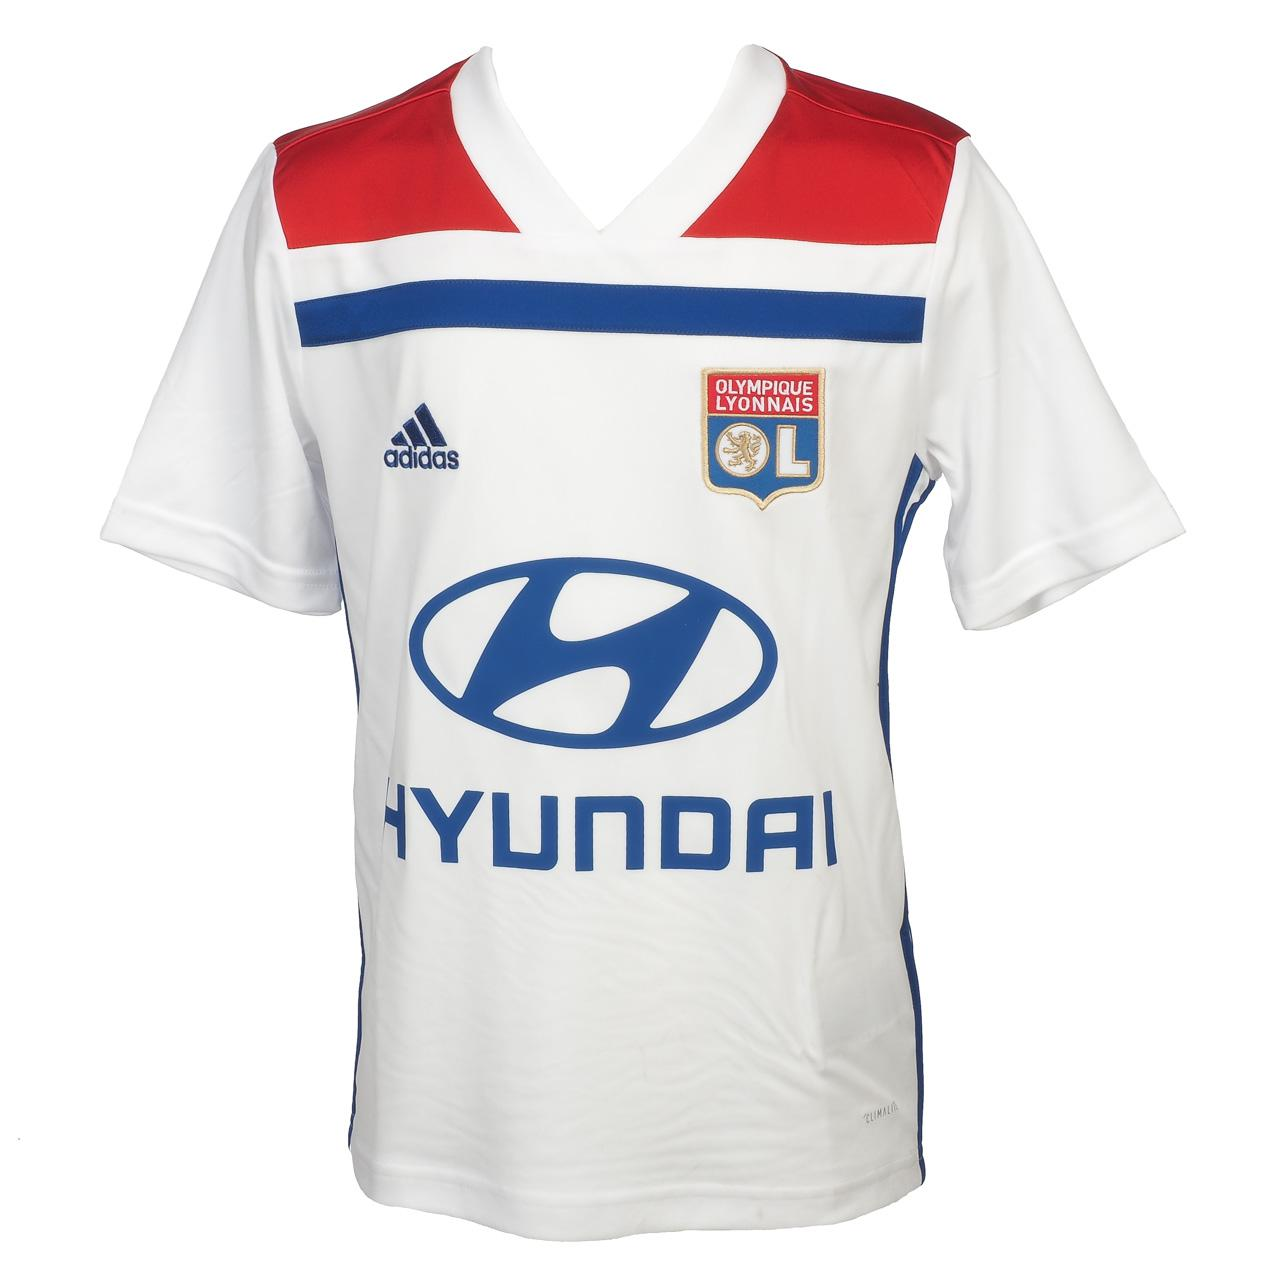 Maillot de football Adidas Lyon maillot jr 2018 19 Blanc 35975 --Neuf